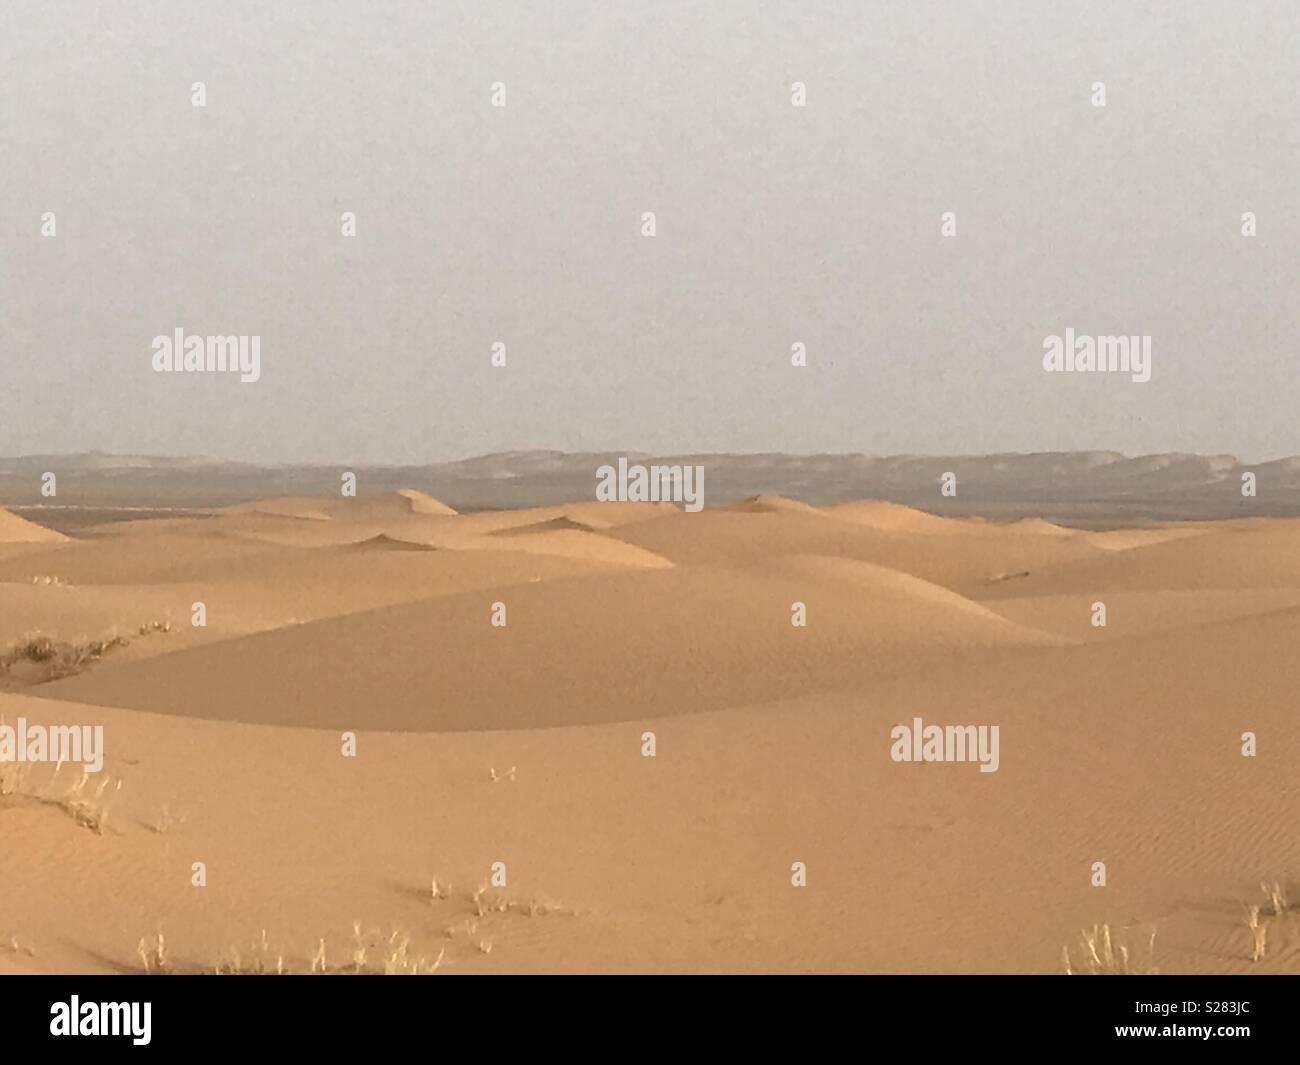 Sea of sand dunes Erg Chebbi Sahara Desert Stock Photo